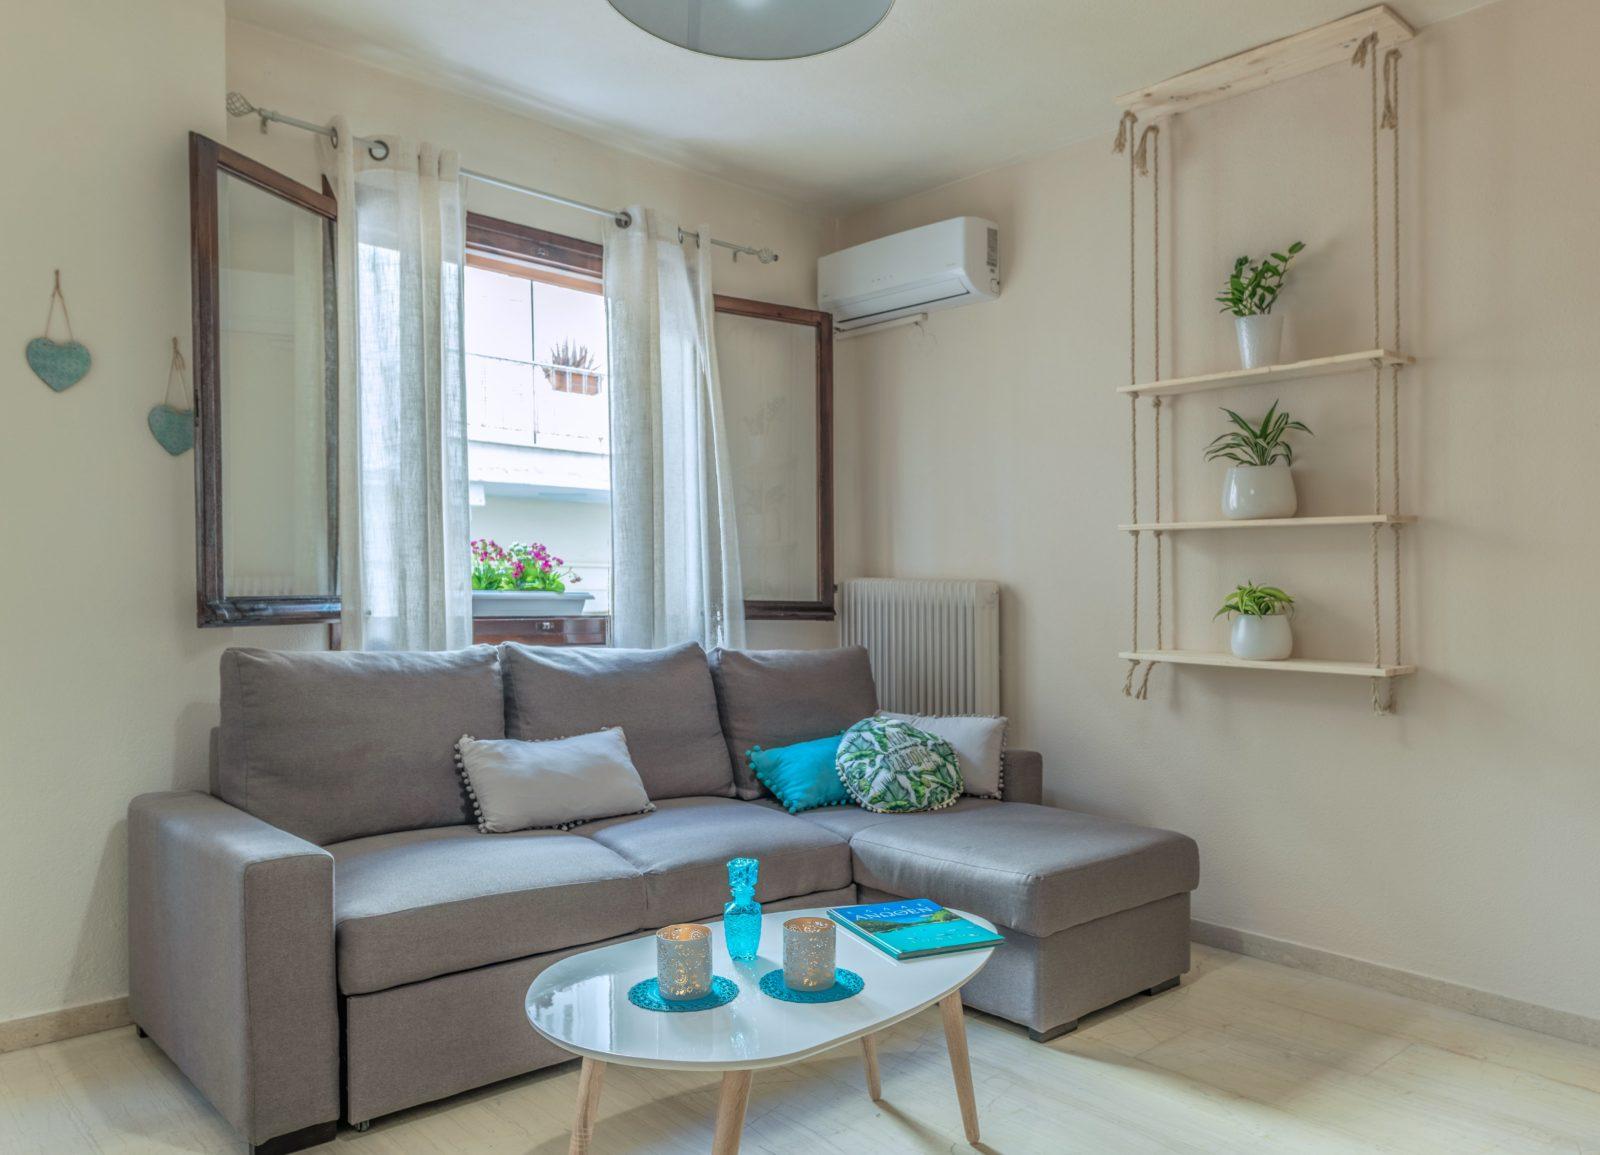 Airbnb apartment Heraklion centre family friendly excellent location spacious kidslovegreece value for money crete knossos